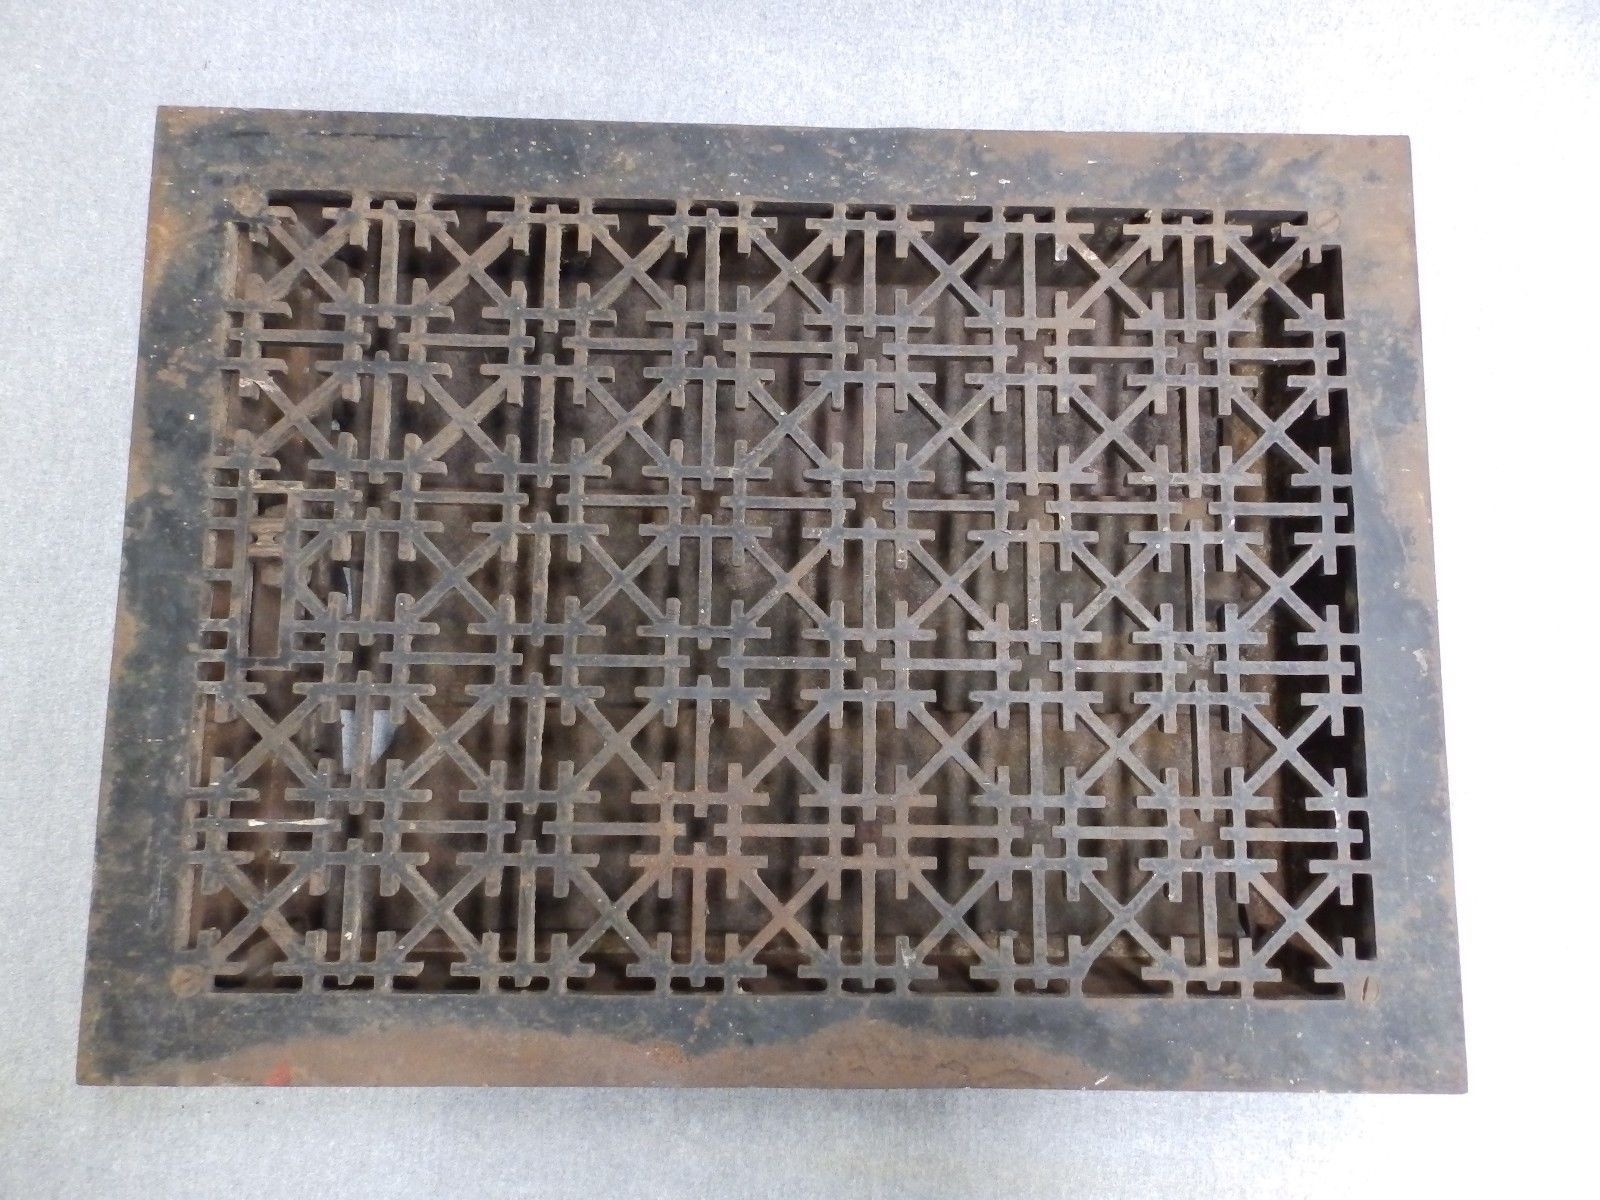 Decorative Grates Registers Antique Cast Iron Heat Register Grate Vent Old Vintage Hardware